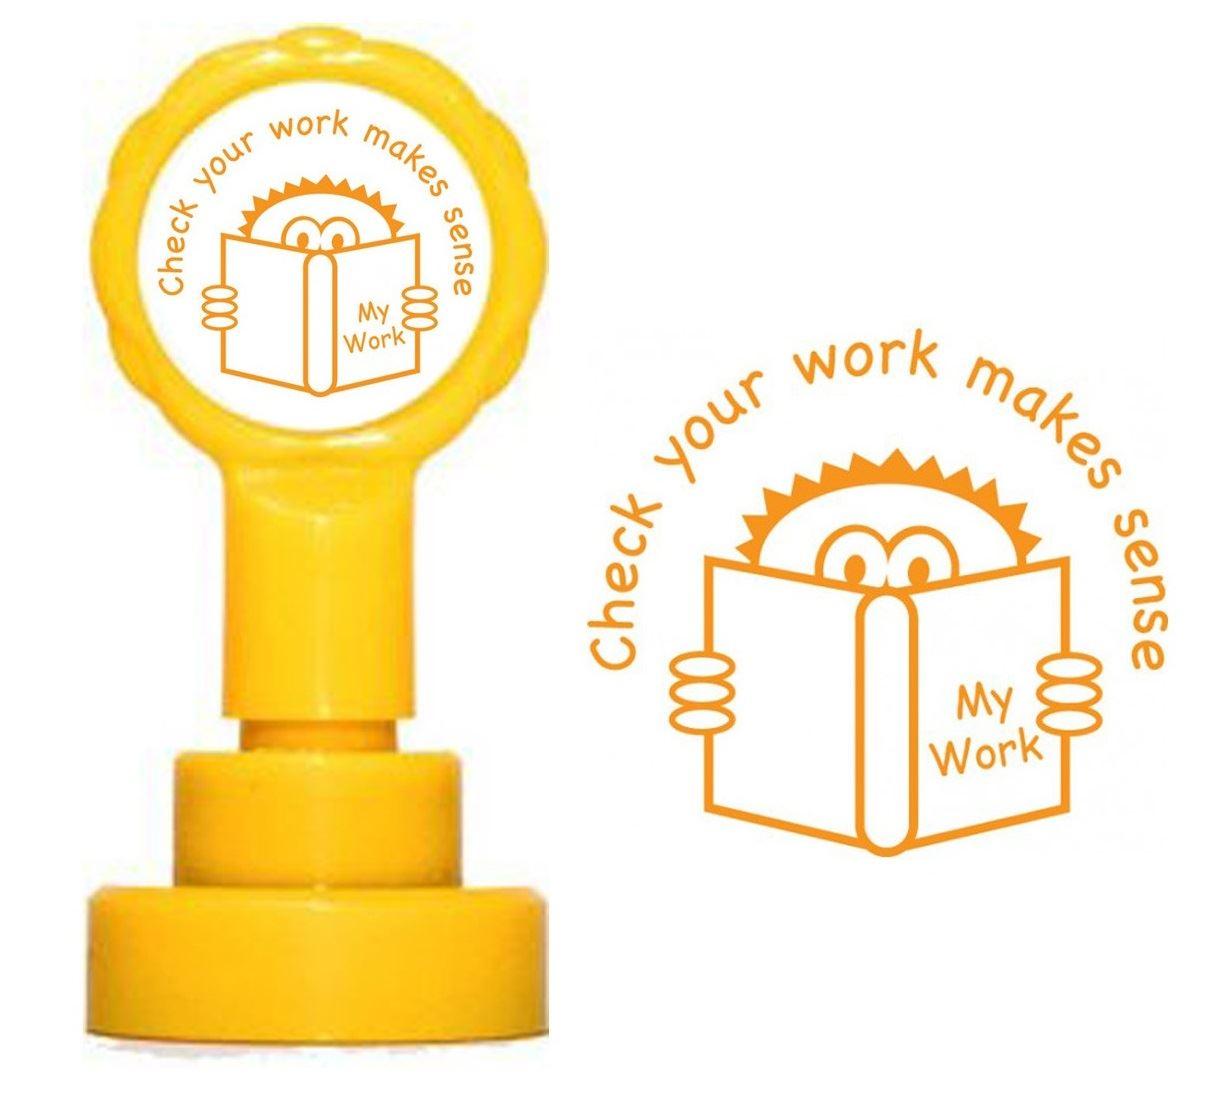 Self inking teacher reward xstamper stamp assisted work T.A